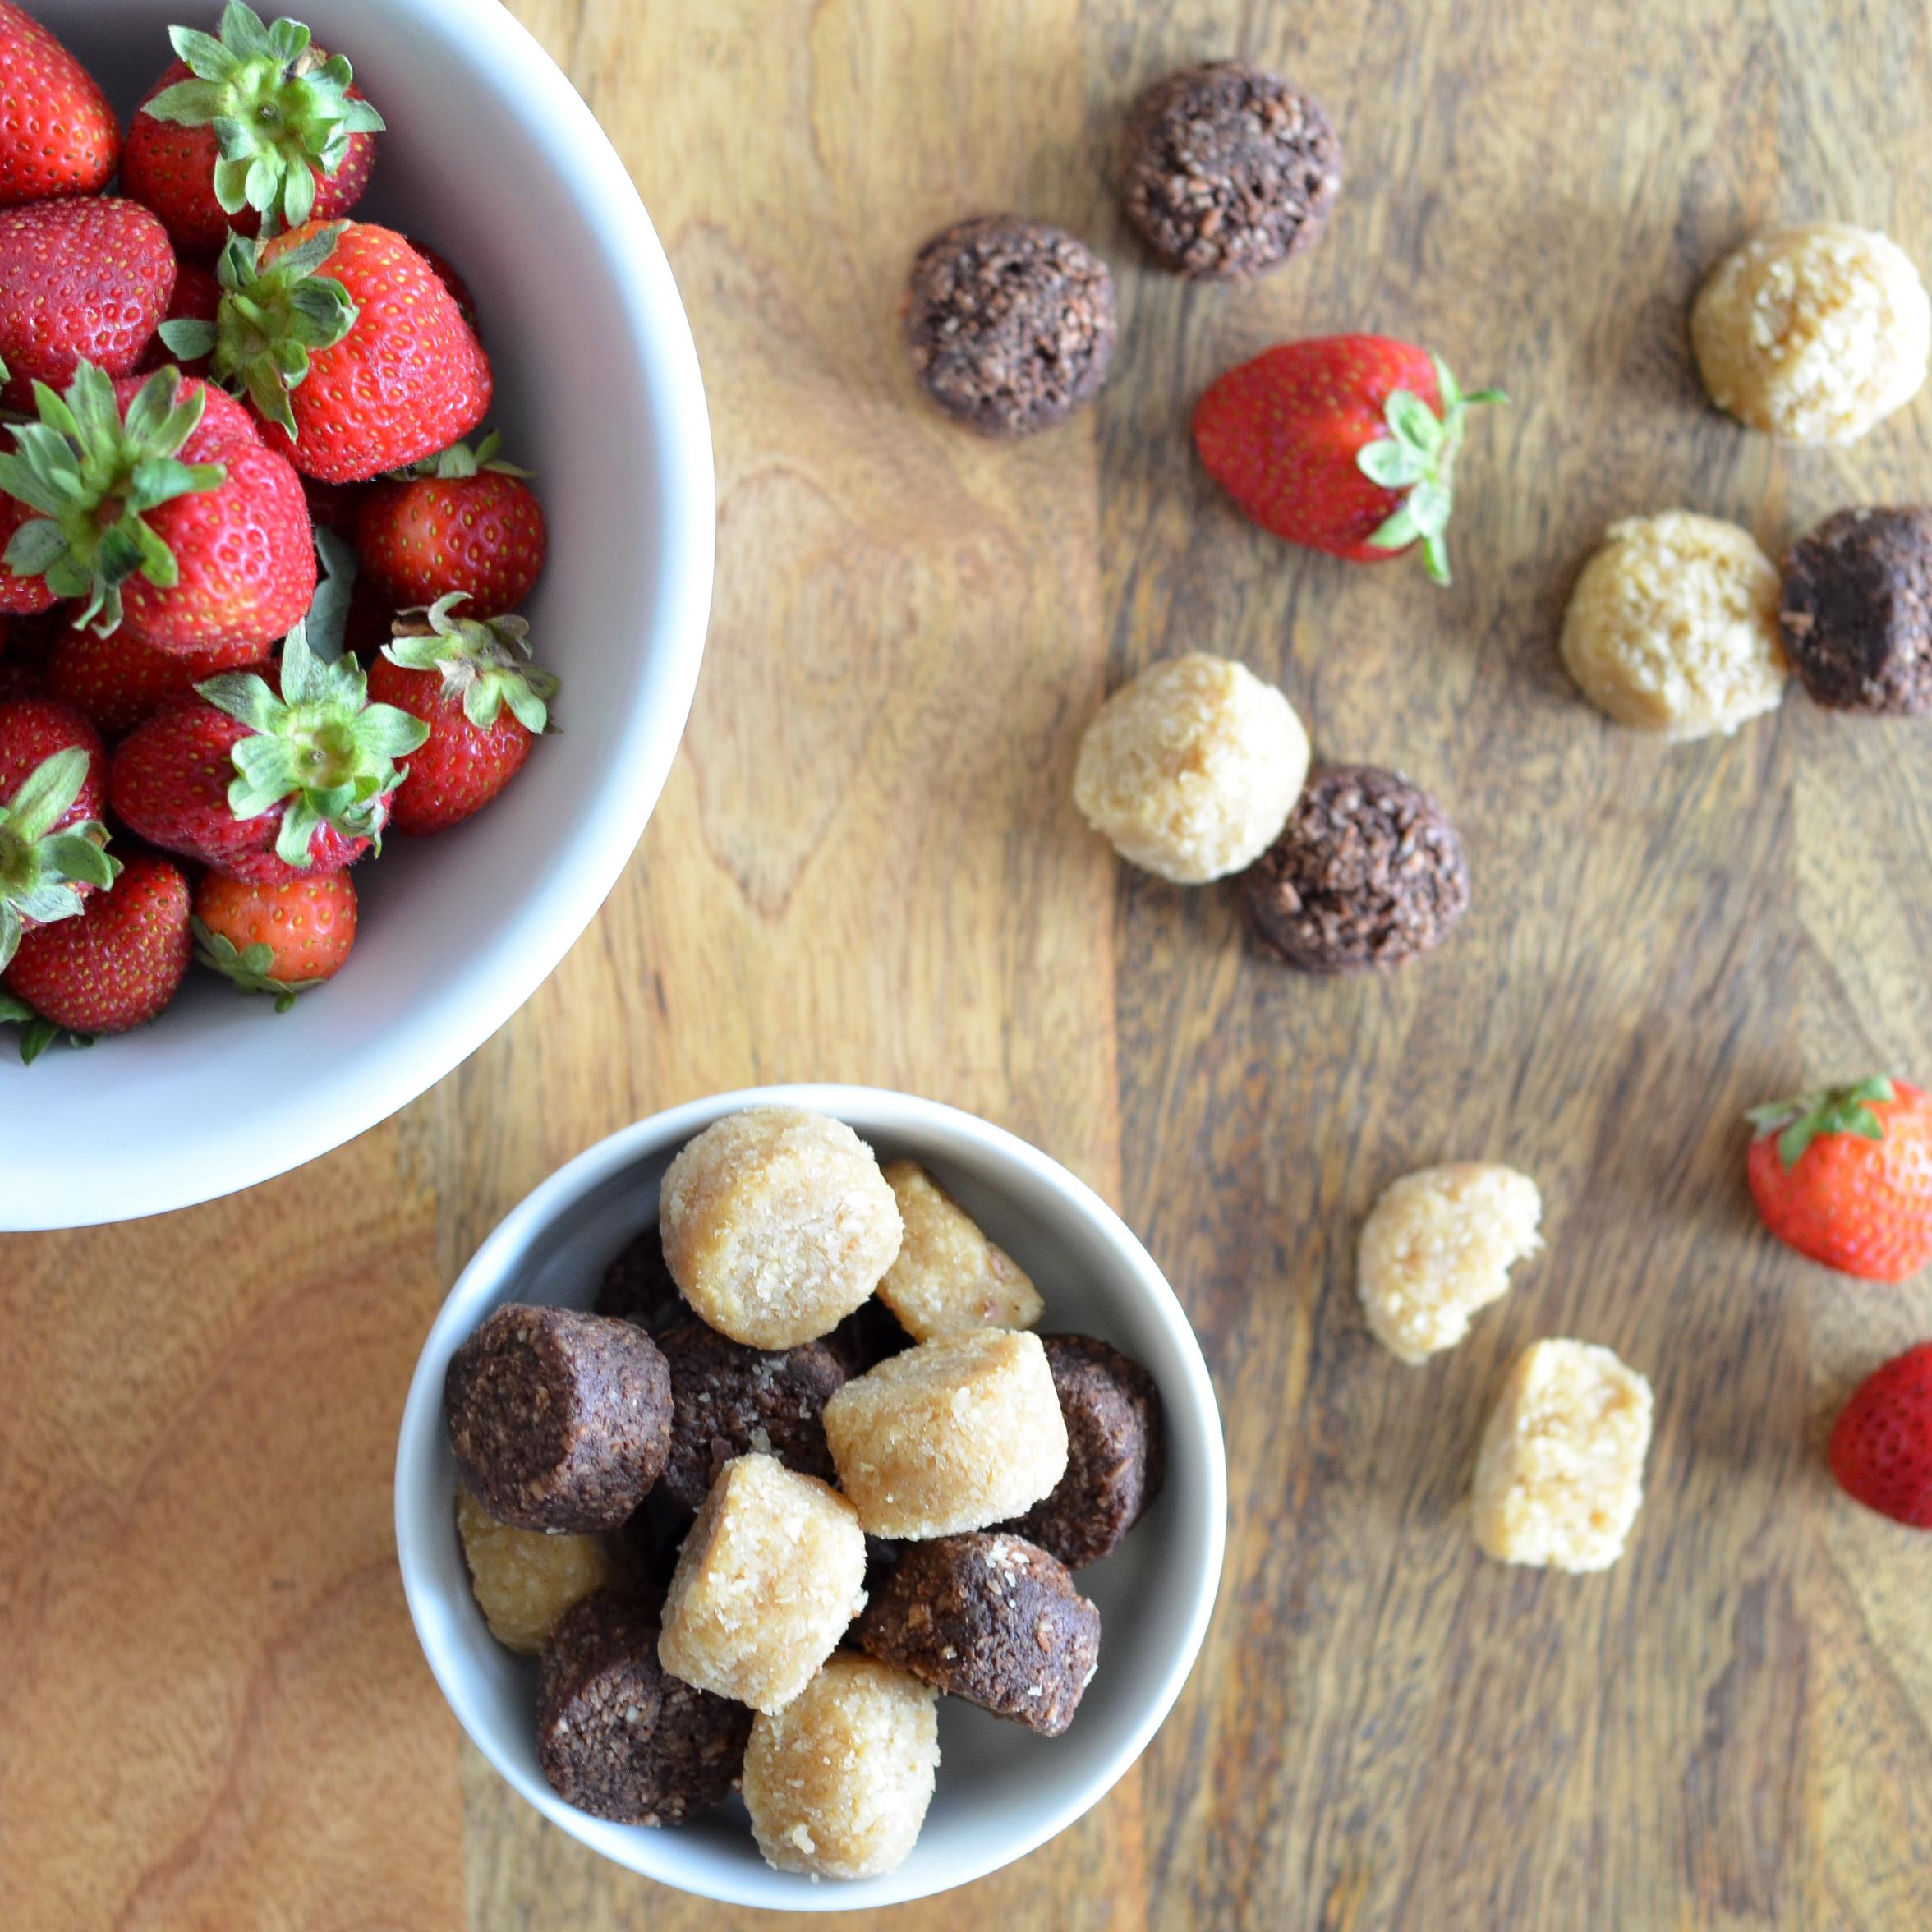 Easy Healthy Desserts No Bake  Five Easy No Bake Healthy Dessert Ideas The